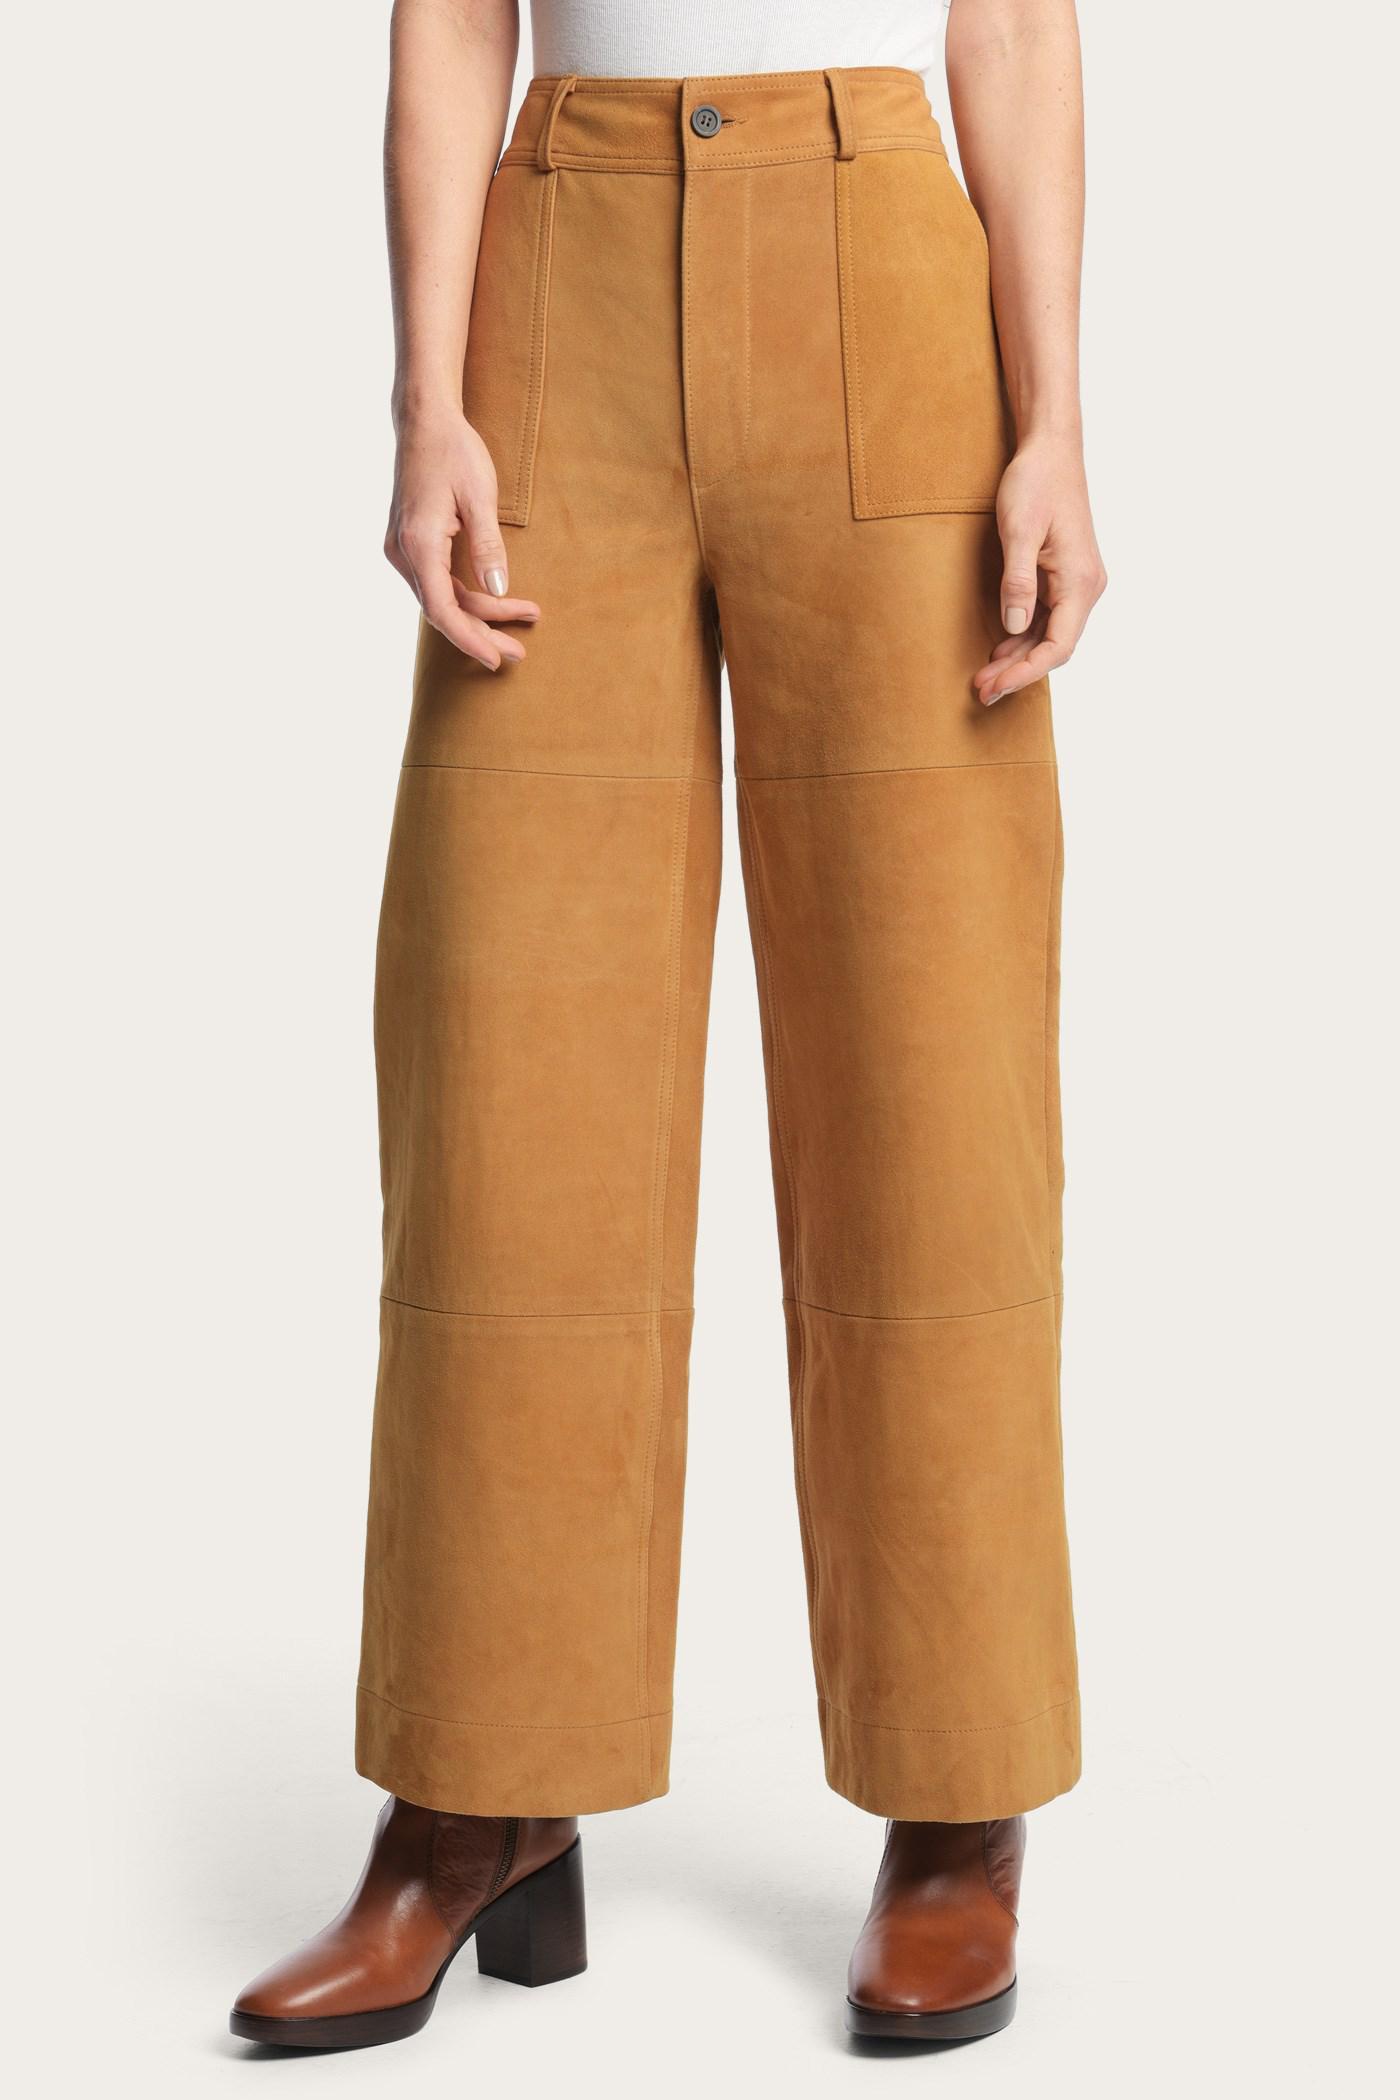 d69e340c2bac Frye - Multicolor Nadia Wide Leg Suede Pant - Lyst. View fullscreen